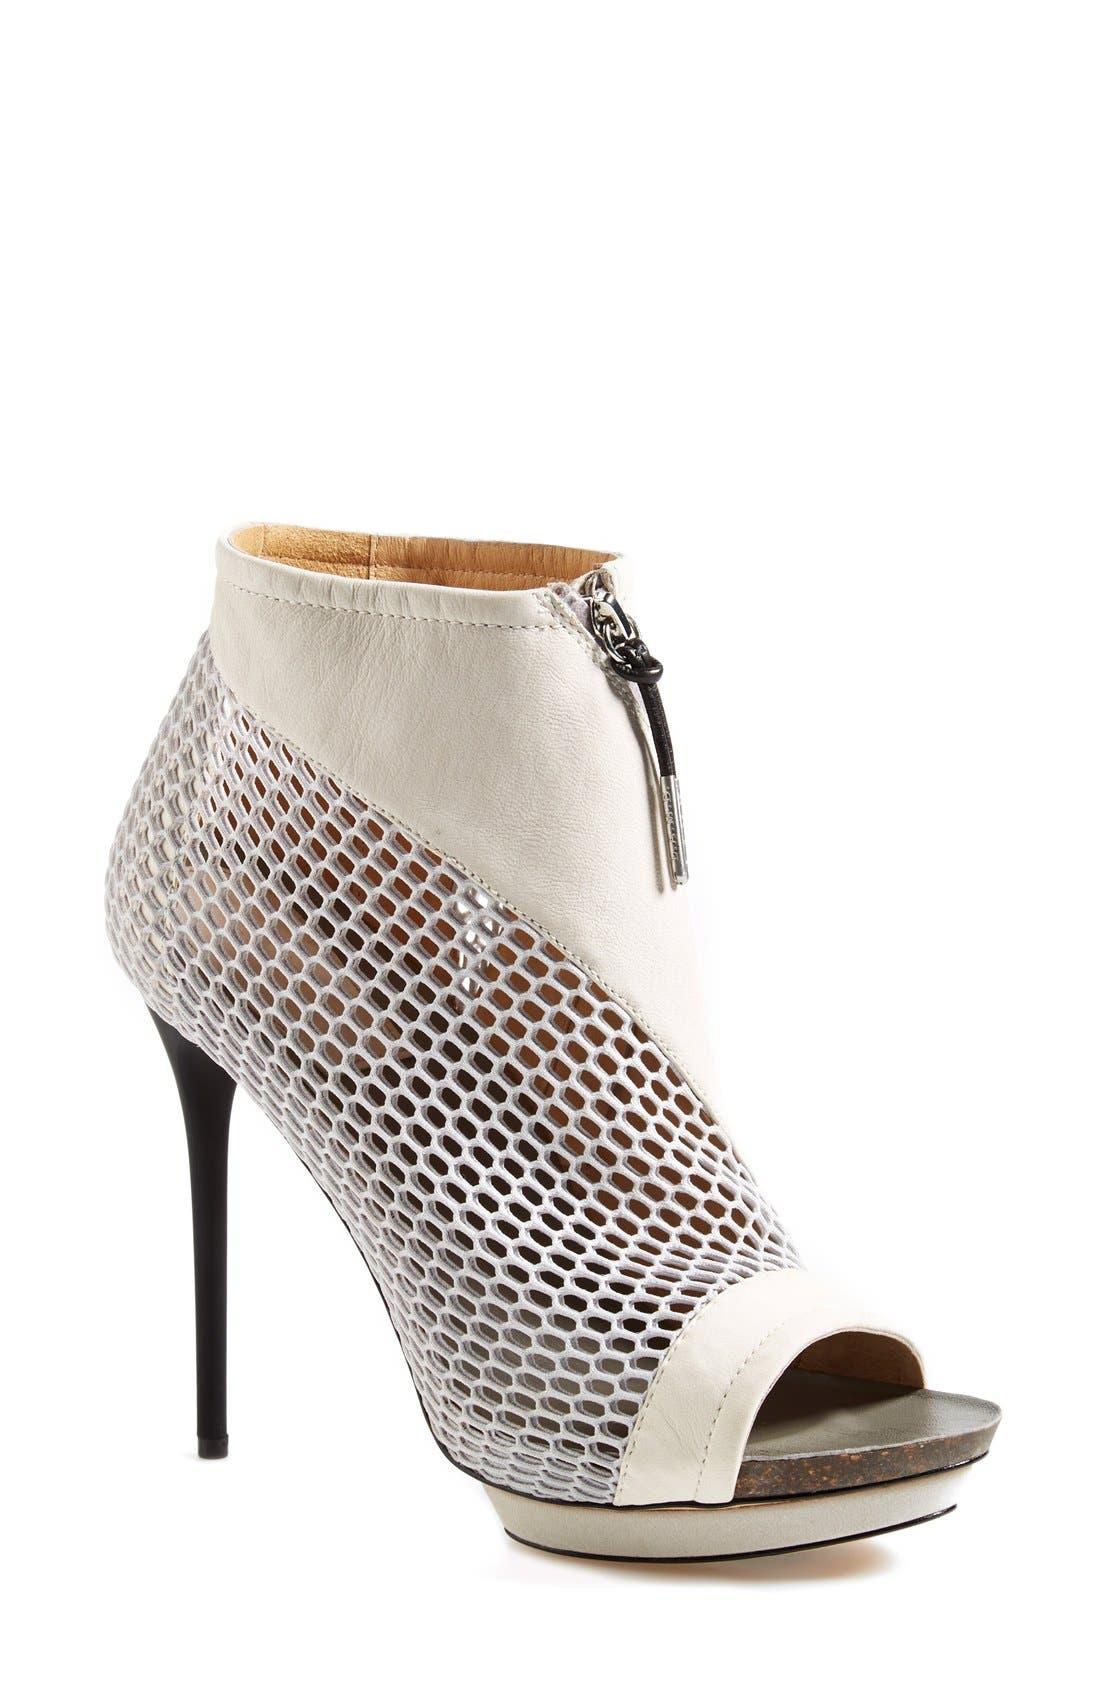 Main Image - L.A.M.B. 'Bicara' Leather & Mesh Platform Bootie (Women)